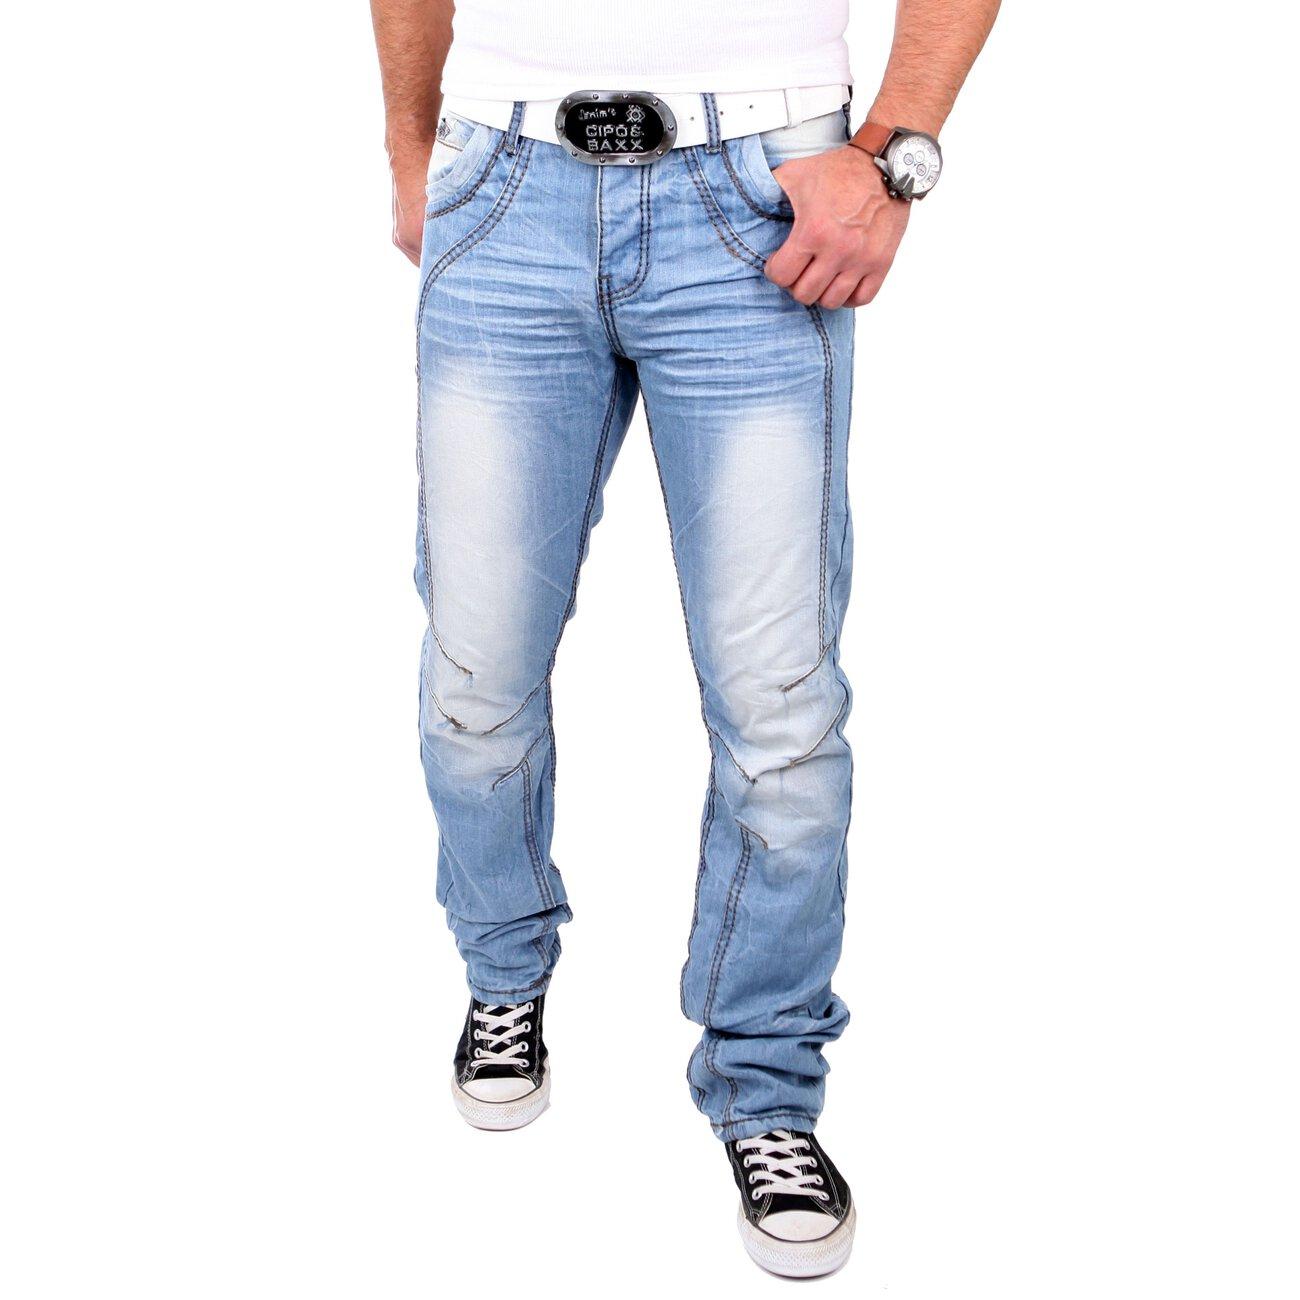 reslad herren jeans straight cut dicke naht look hose. Black Bedroom Furniture Sets. Home Design Ideas